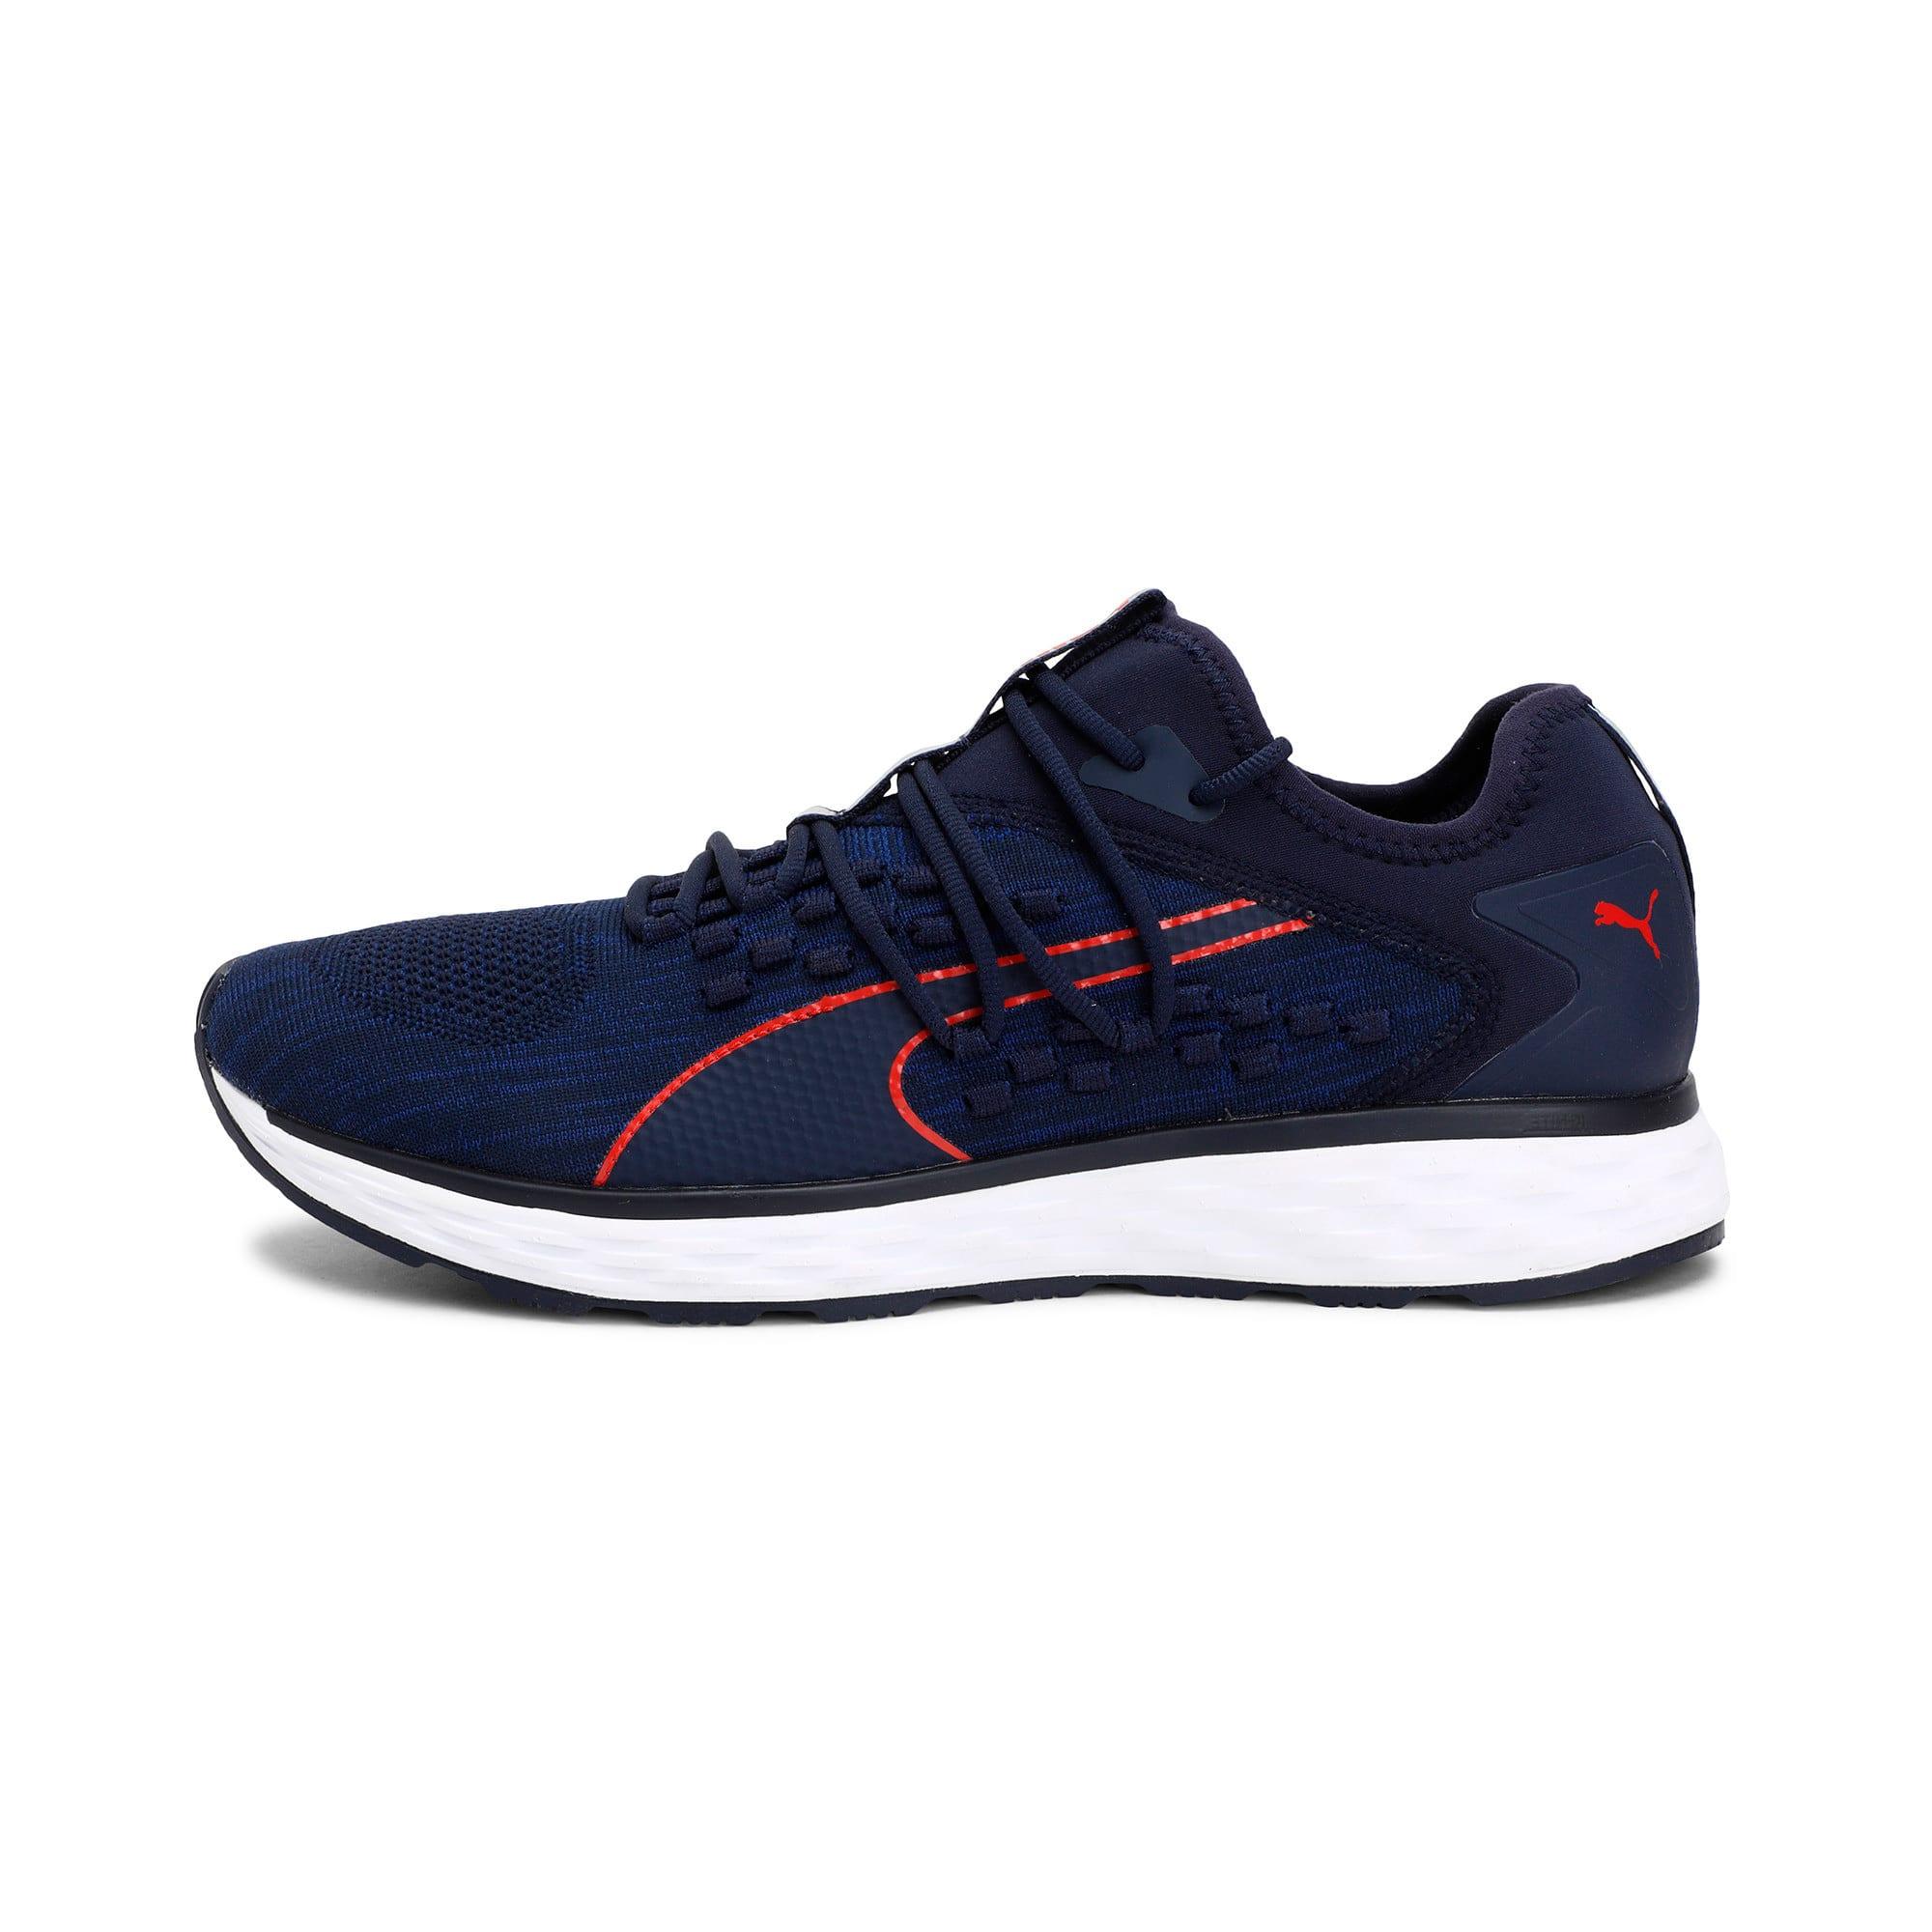 Thumbnail 1 of SPEED FUSEFIT Men's Running Shoes, Peacoat-Sodalite Blue, medium-IND